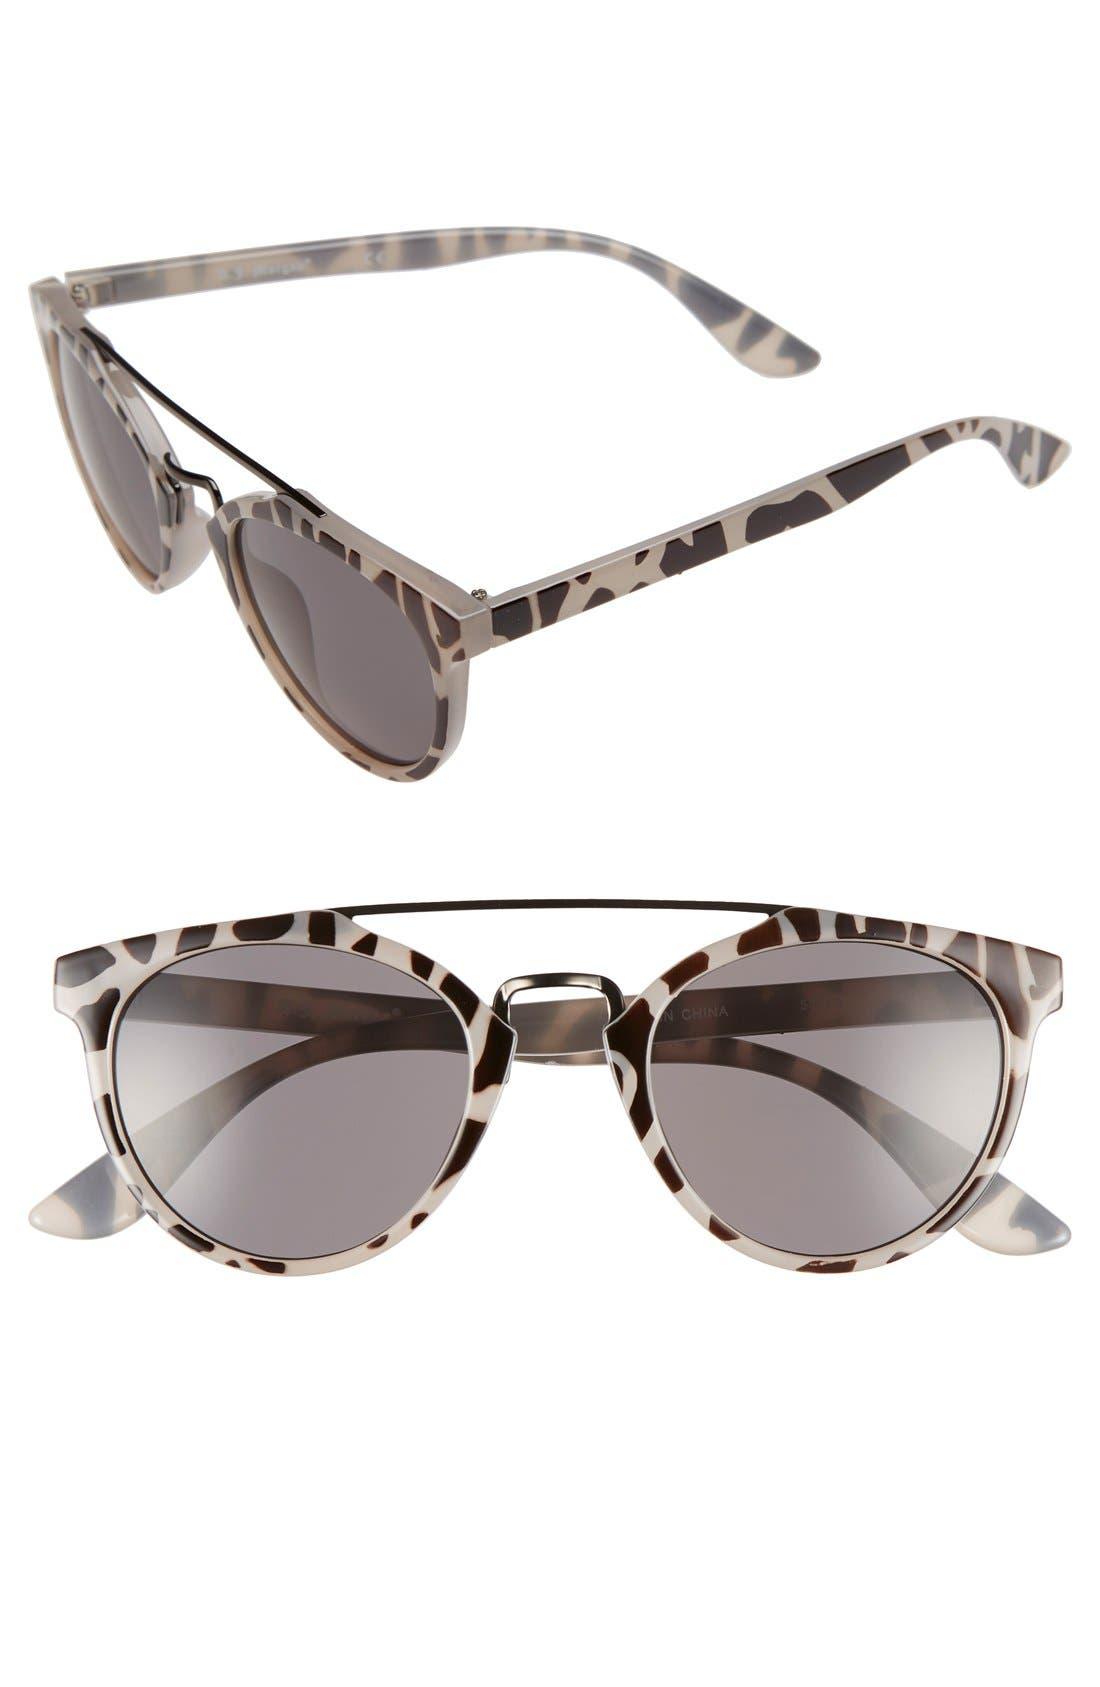 Alternate Image 1 Selected - A.J. Morgan 'Coco' 49mm Sunglasses